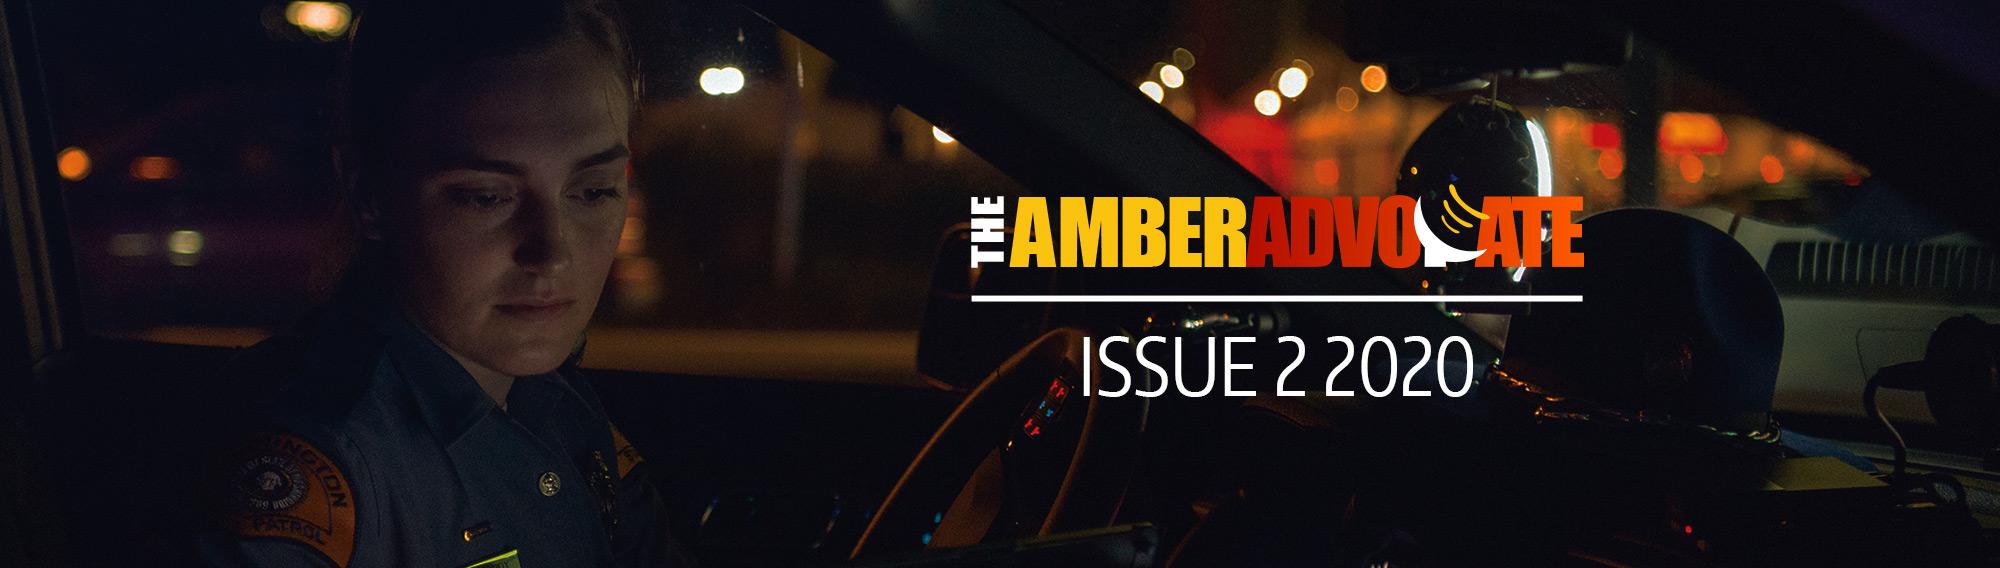 aa42 page header